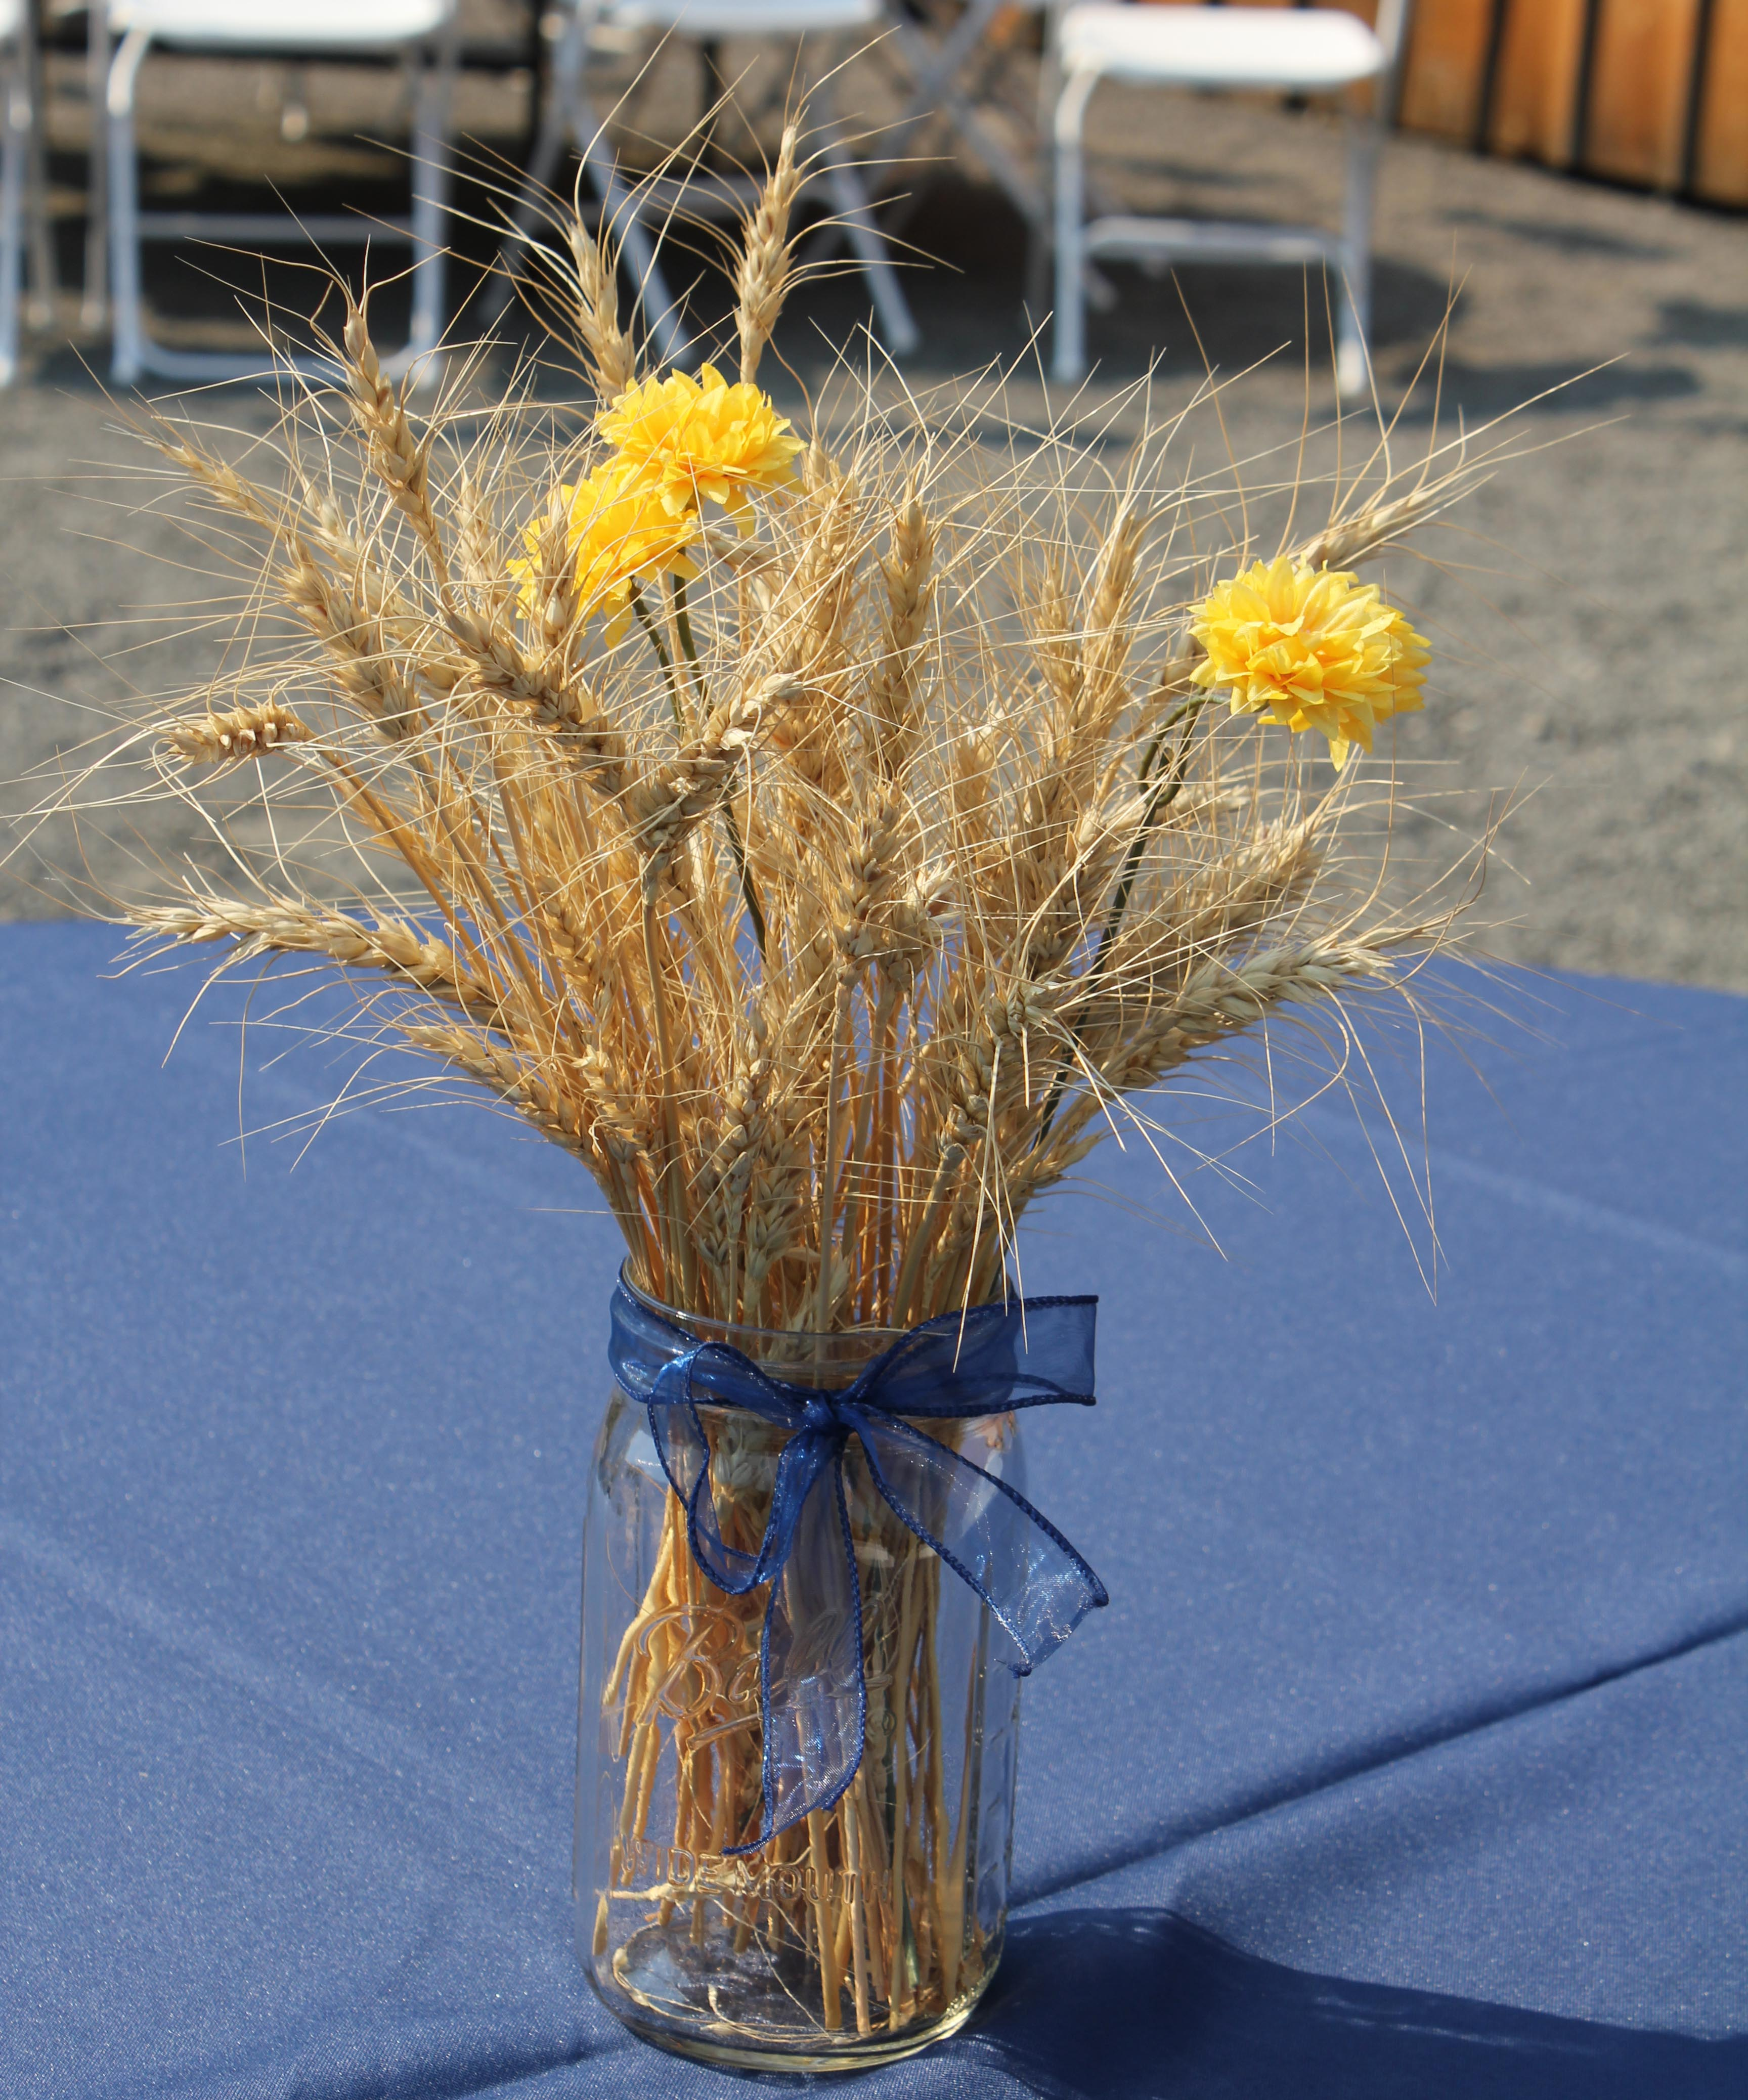 Western photos savvy entertaining for Wheat centerpieces